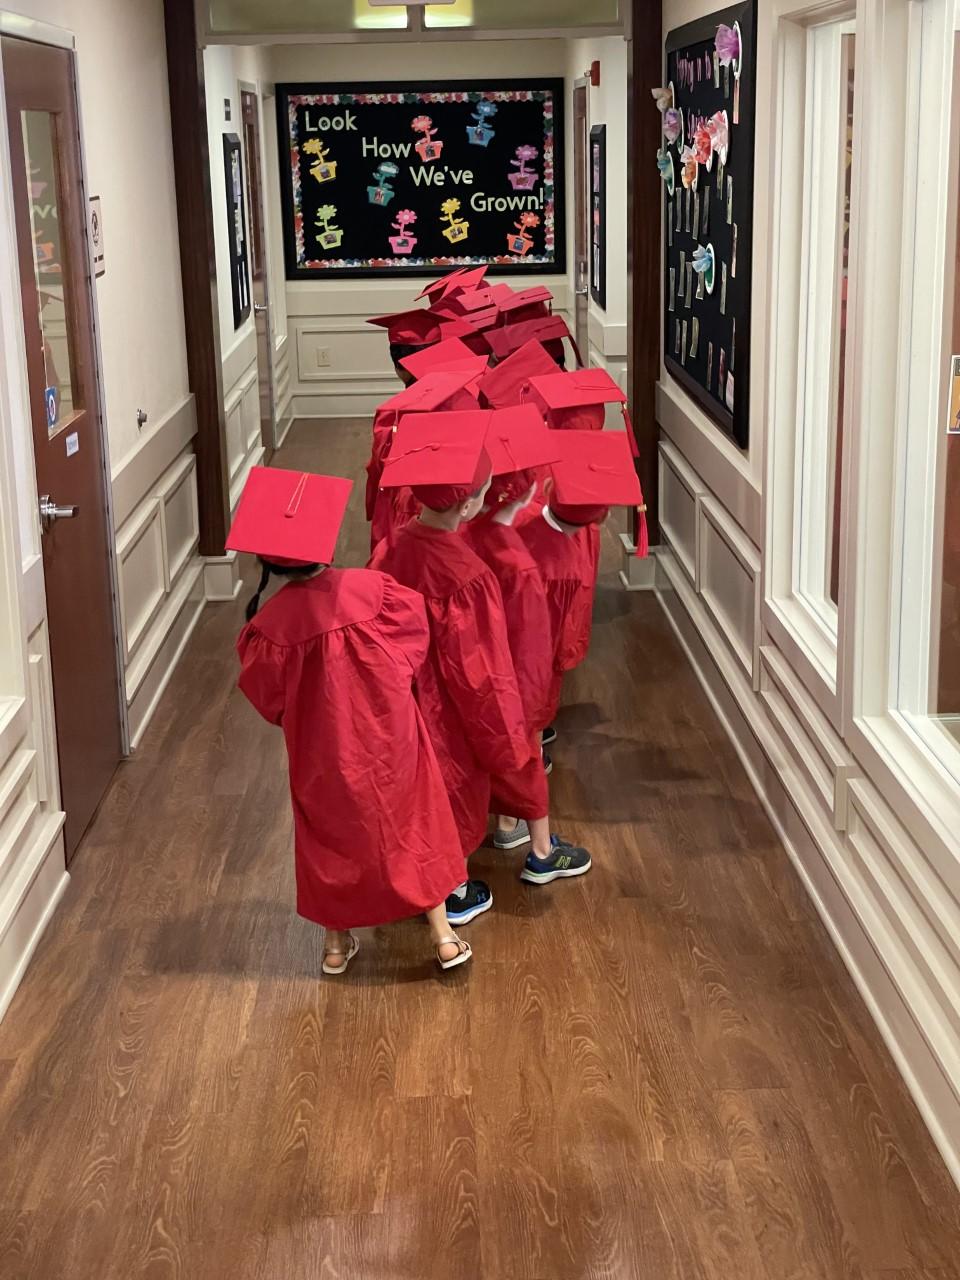 Pre- Kindergarten Graduate , See How We've Grown